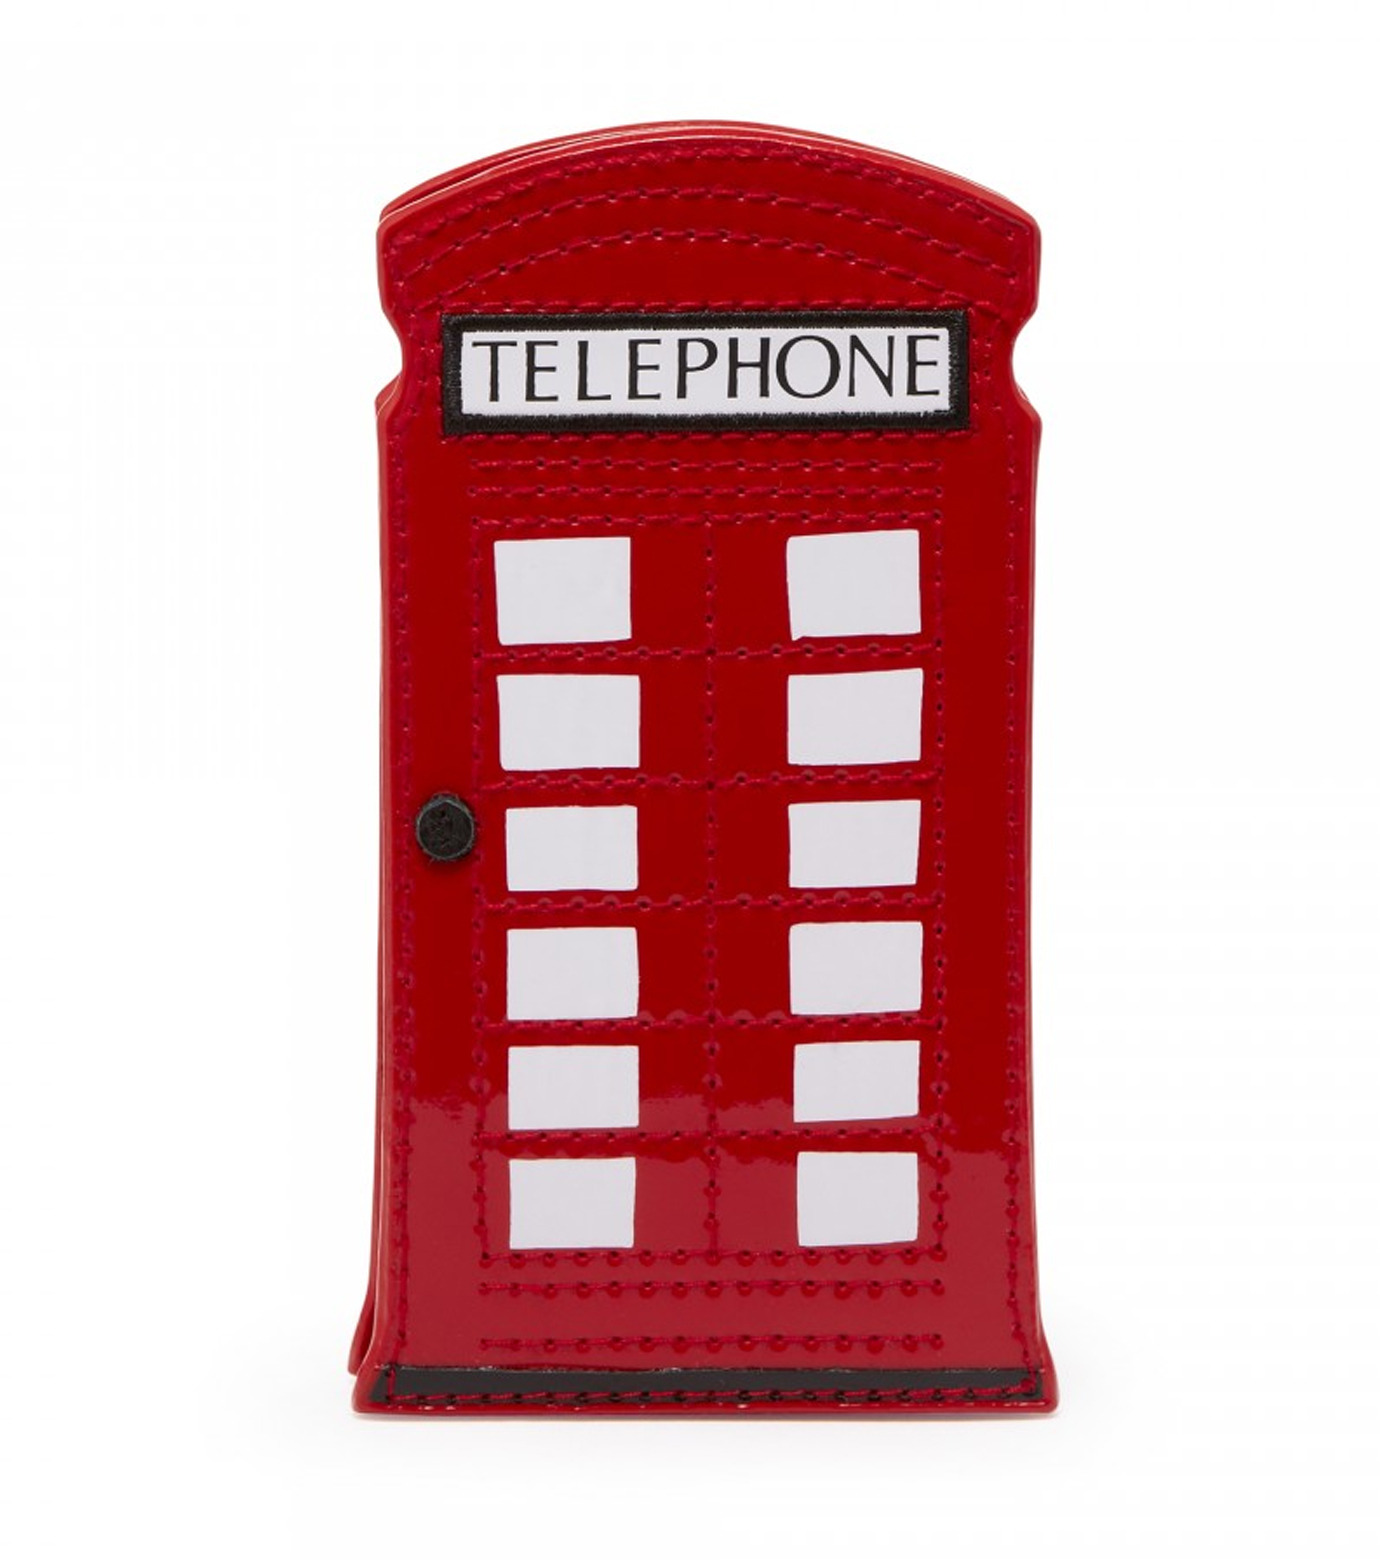 Lulu Guinness(ルル・ギネス)のTelephone Box Phone Holder-RED(ケースiphone5/5s/se/case iphone5/5s/se)-50003235-62 拡大詳細画像1